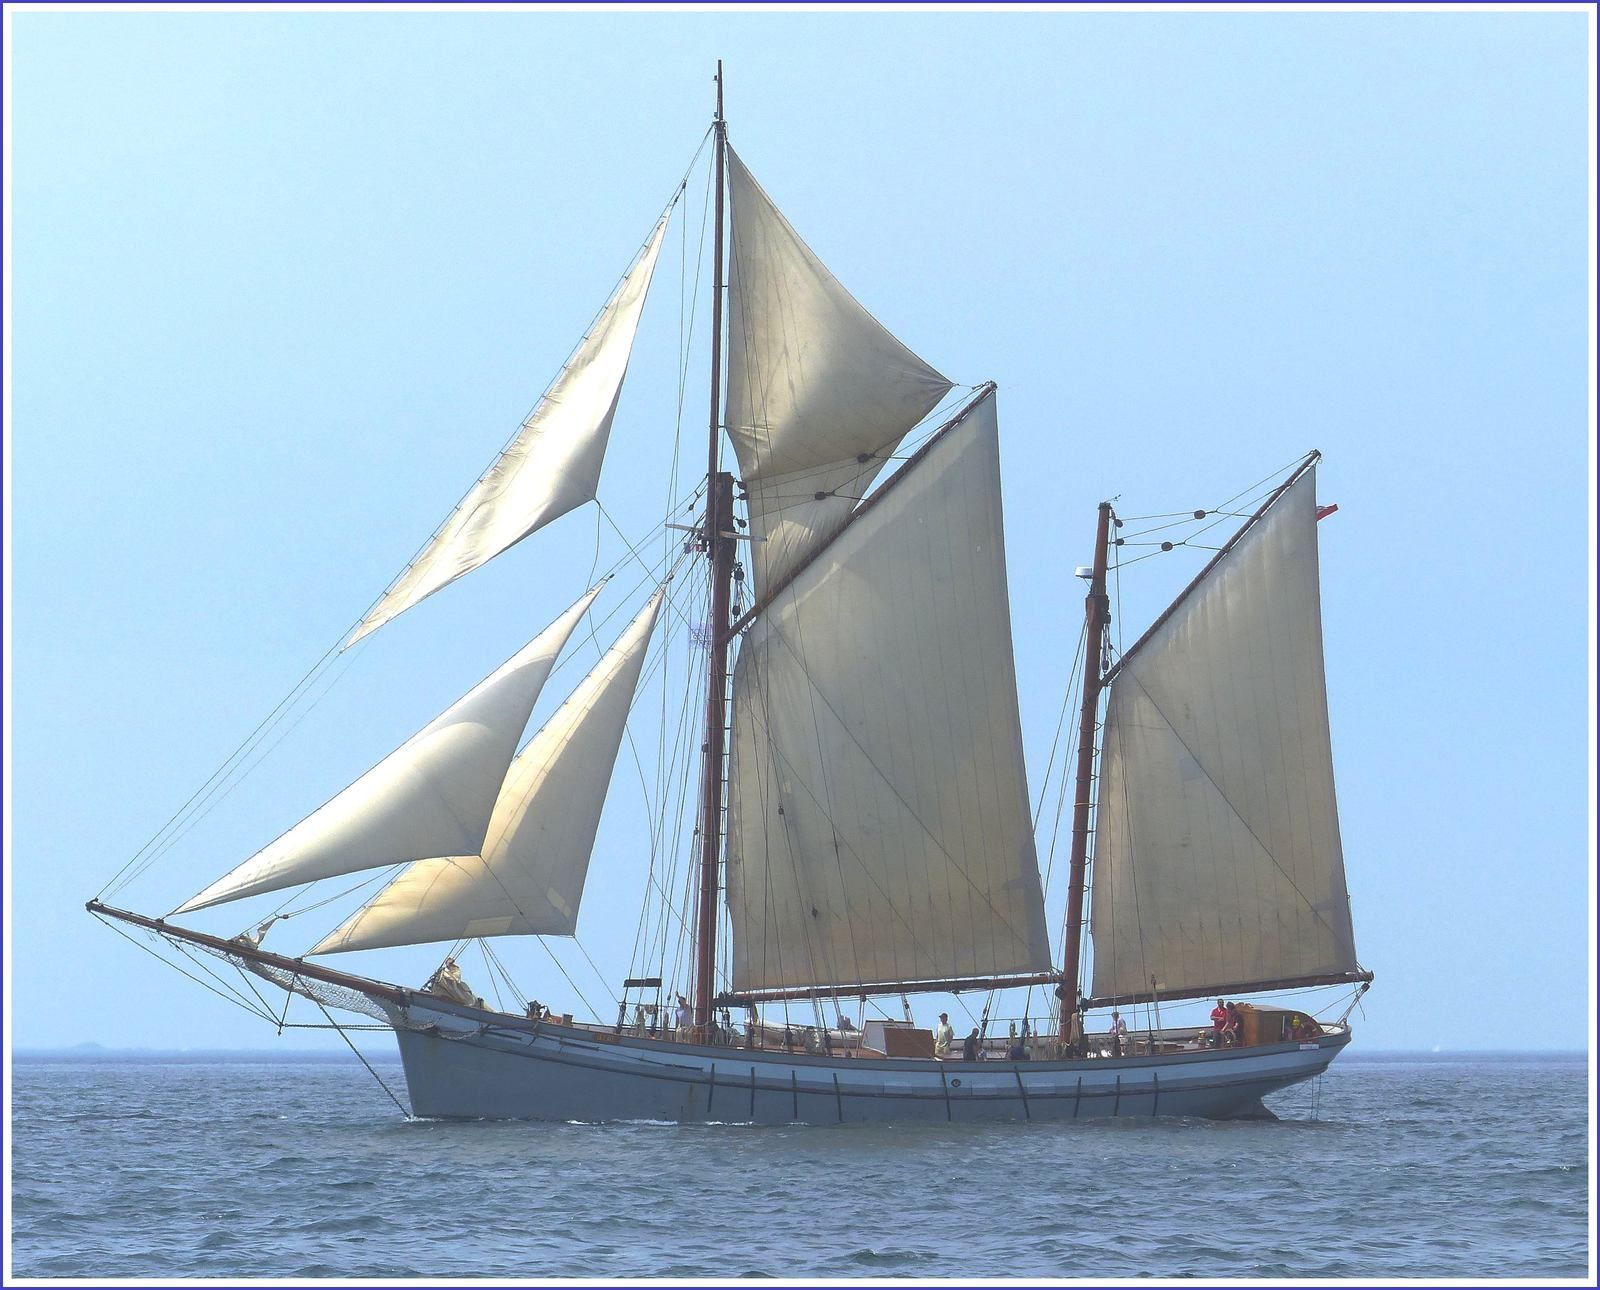 Irene of Bridgwater